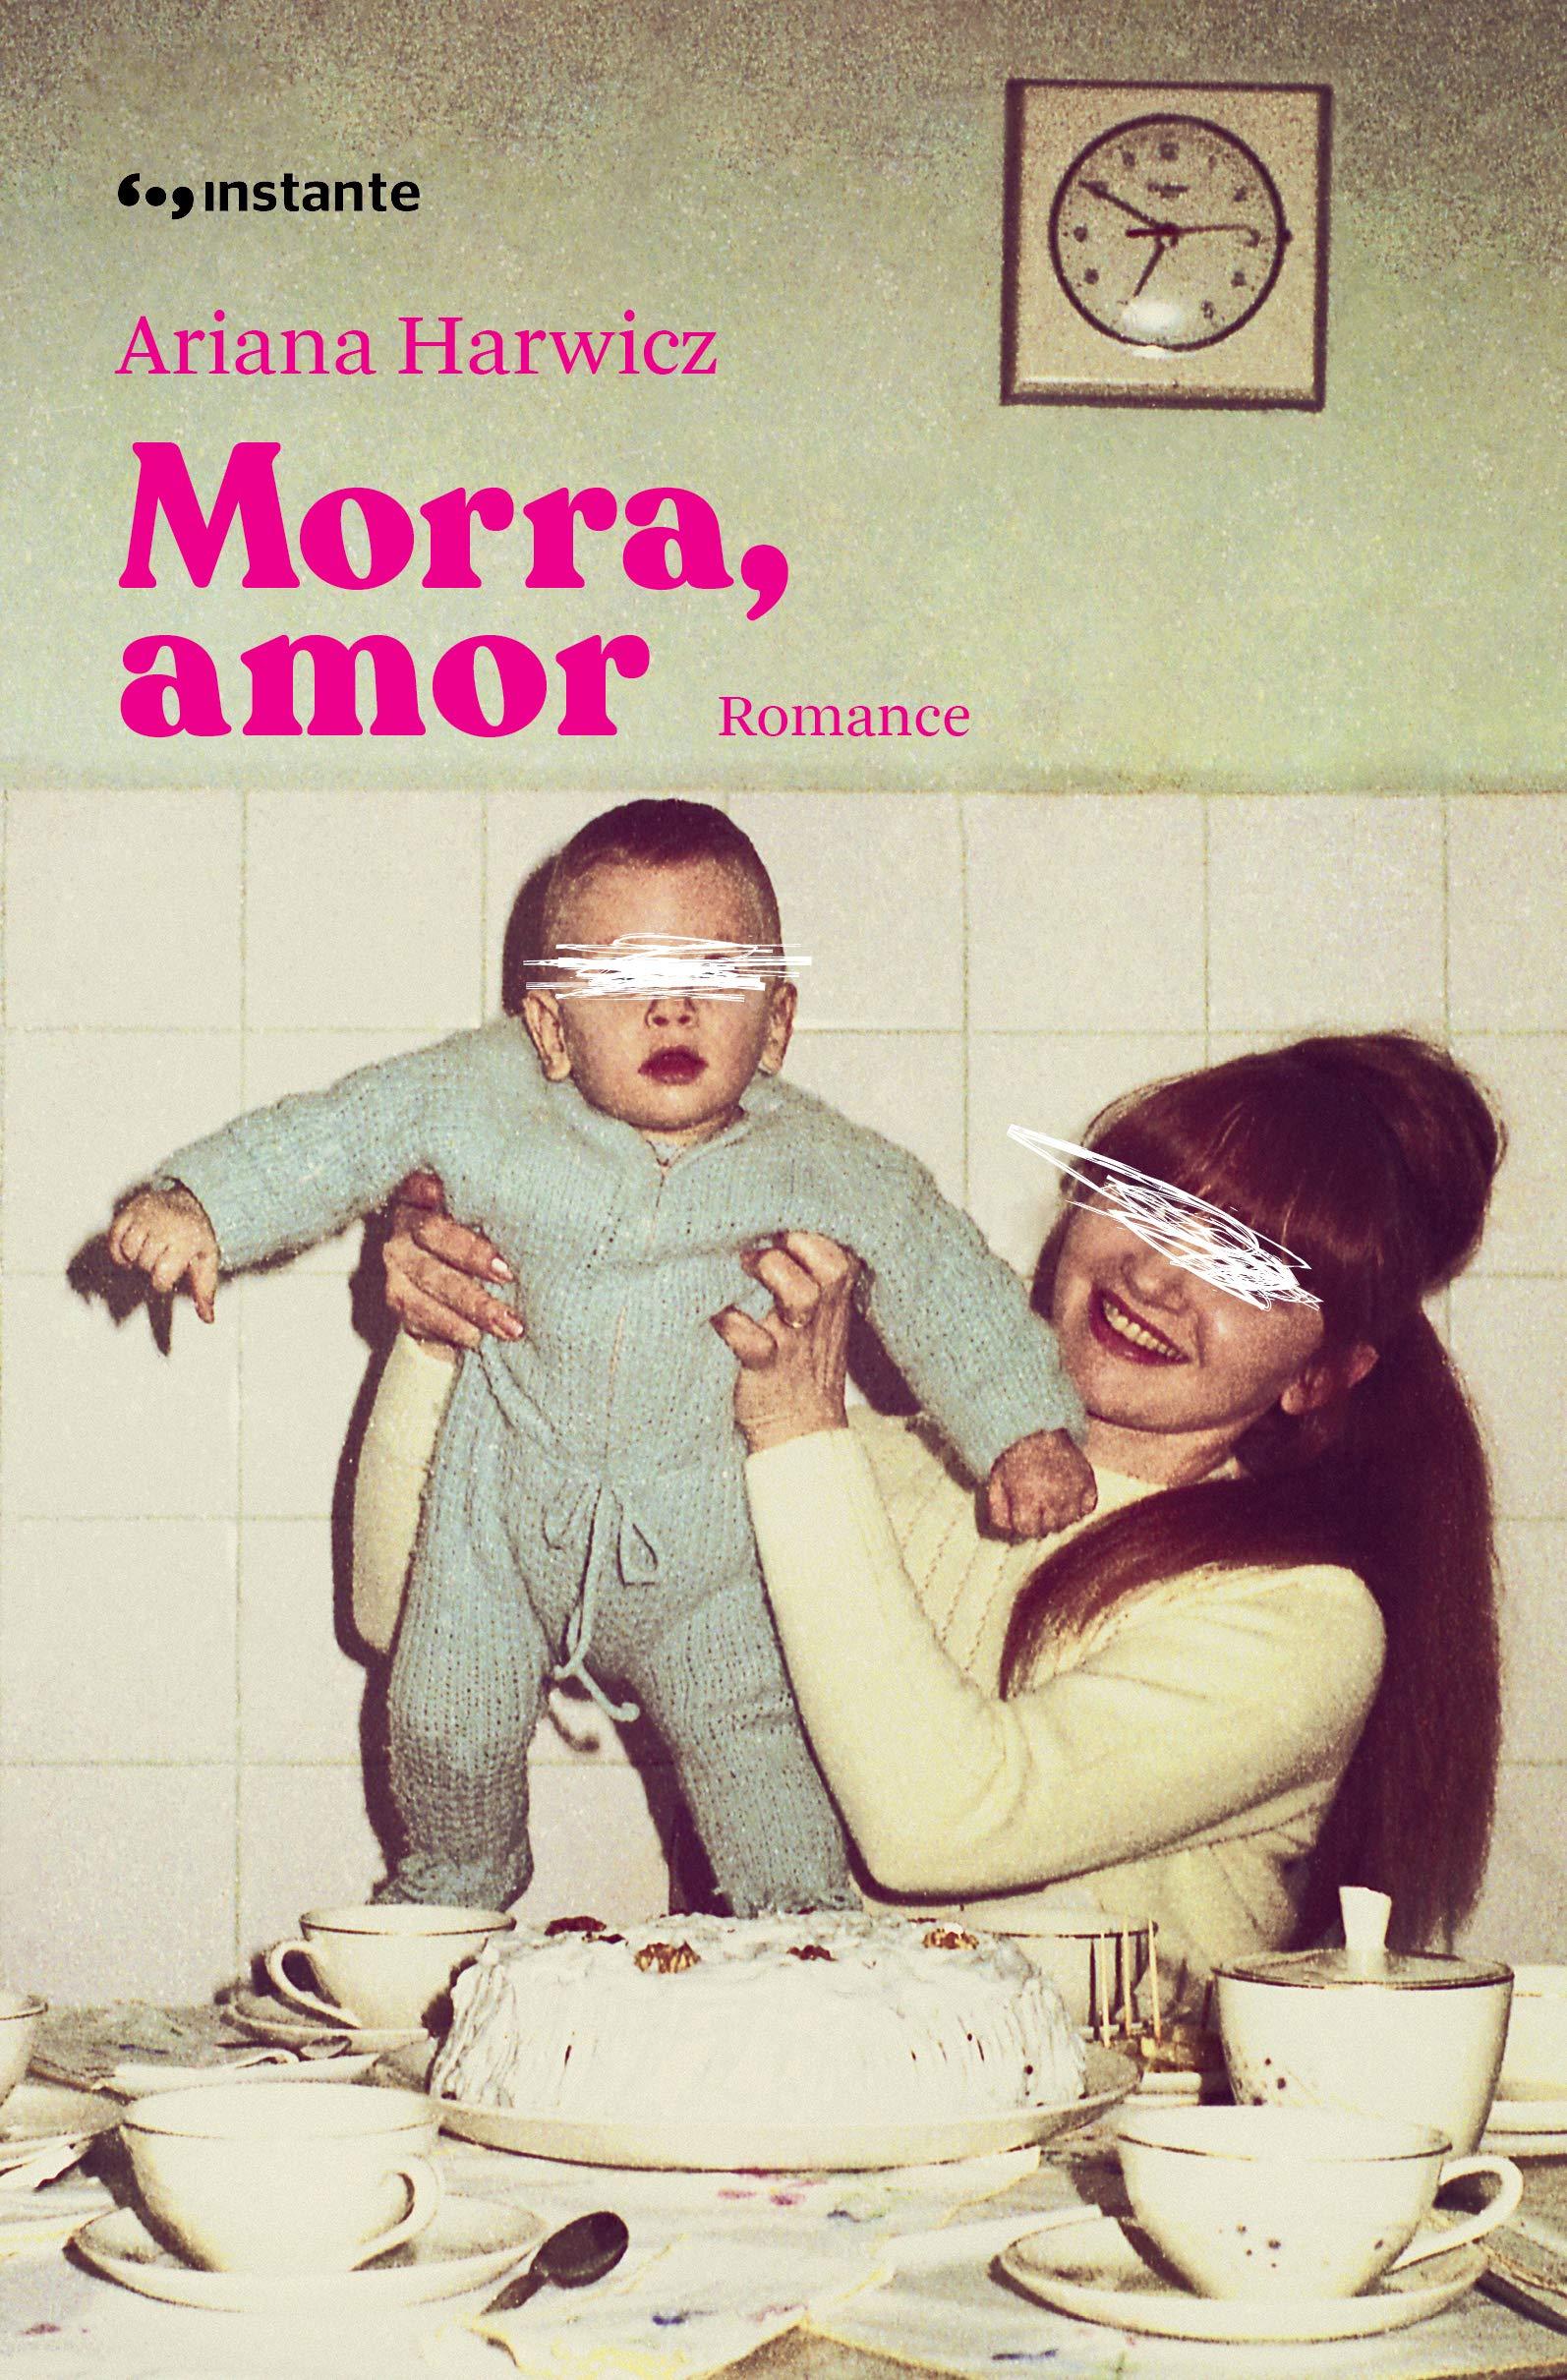 [RESENHA] MORRA, AMOR, DE ARIANA HARWICZ